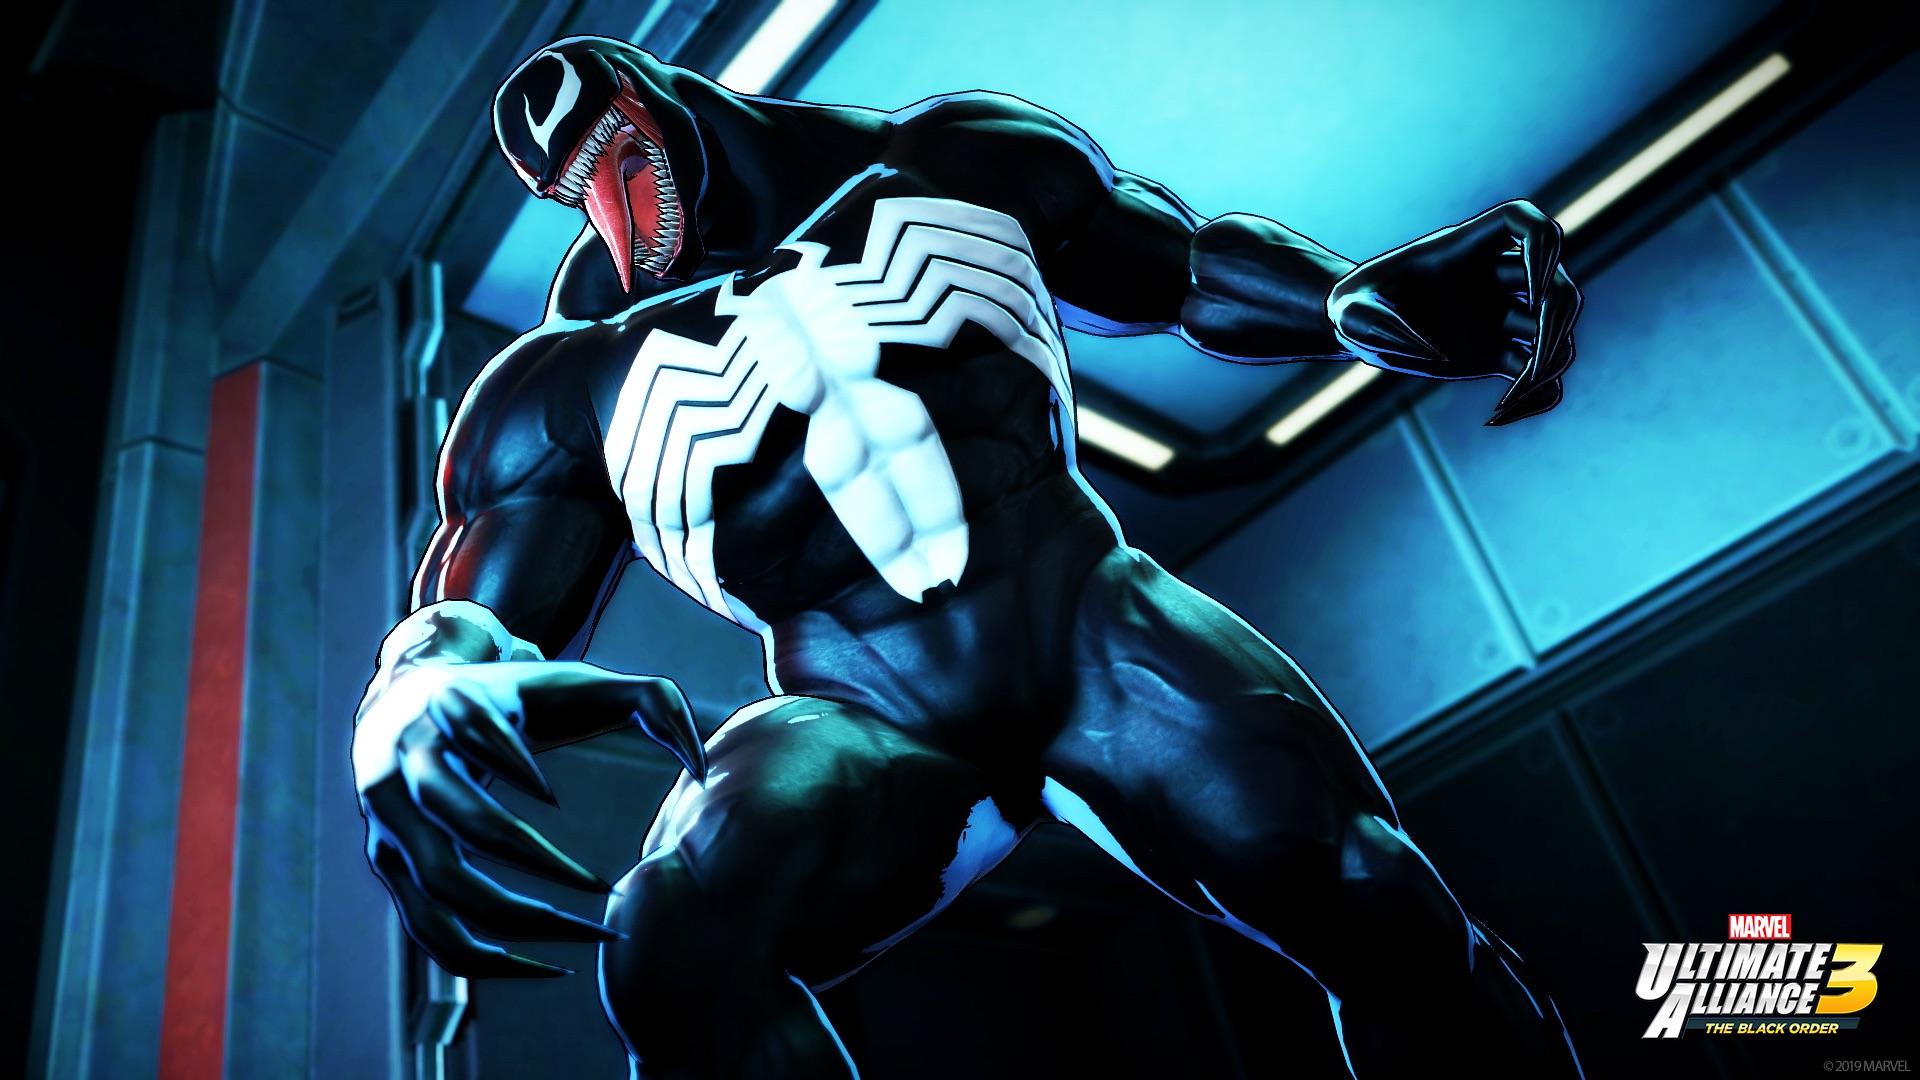 Marvel Ultimate Alliance 3: The Black Order Screenshot 3